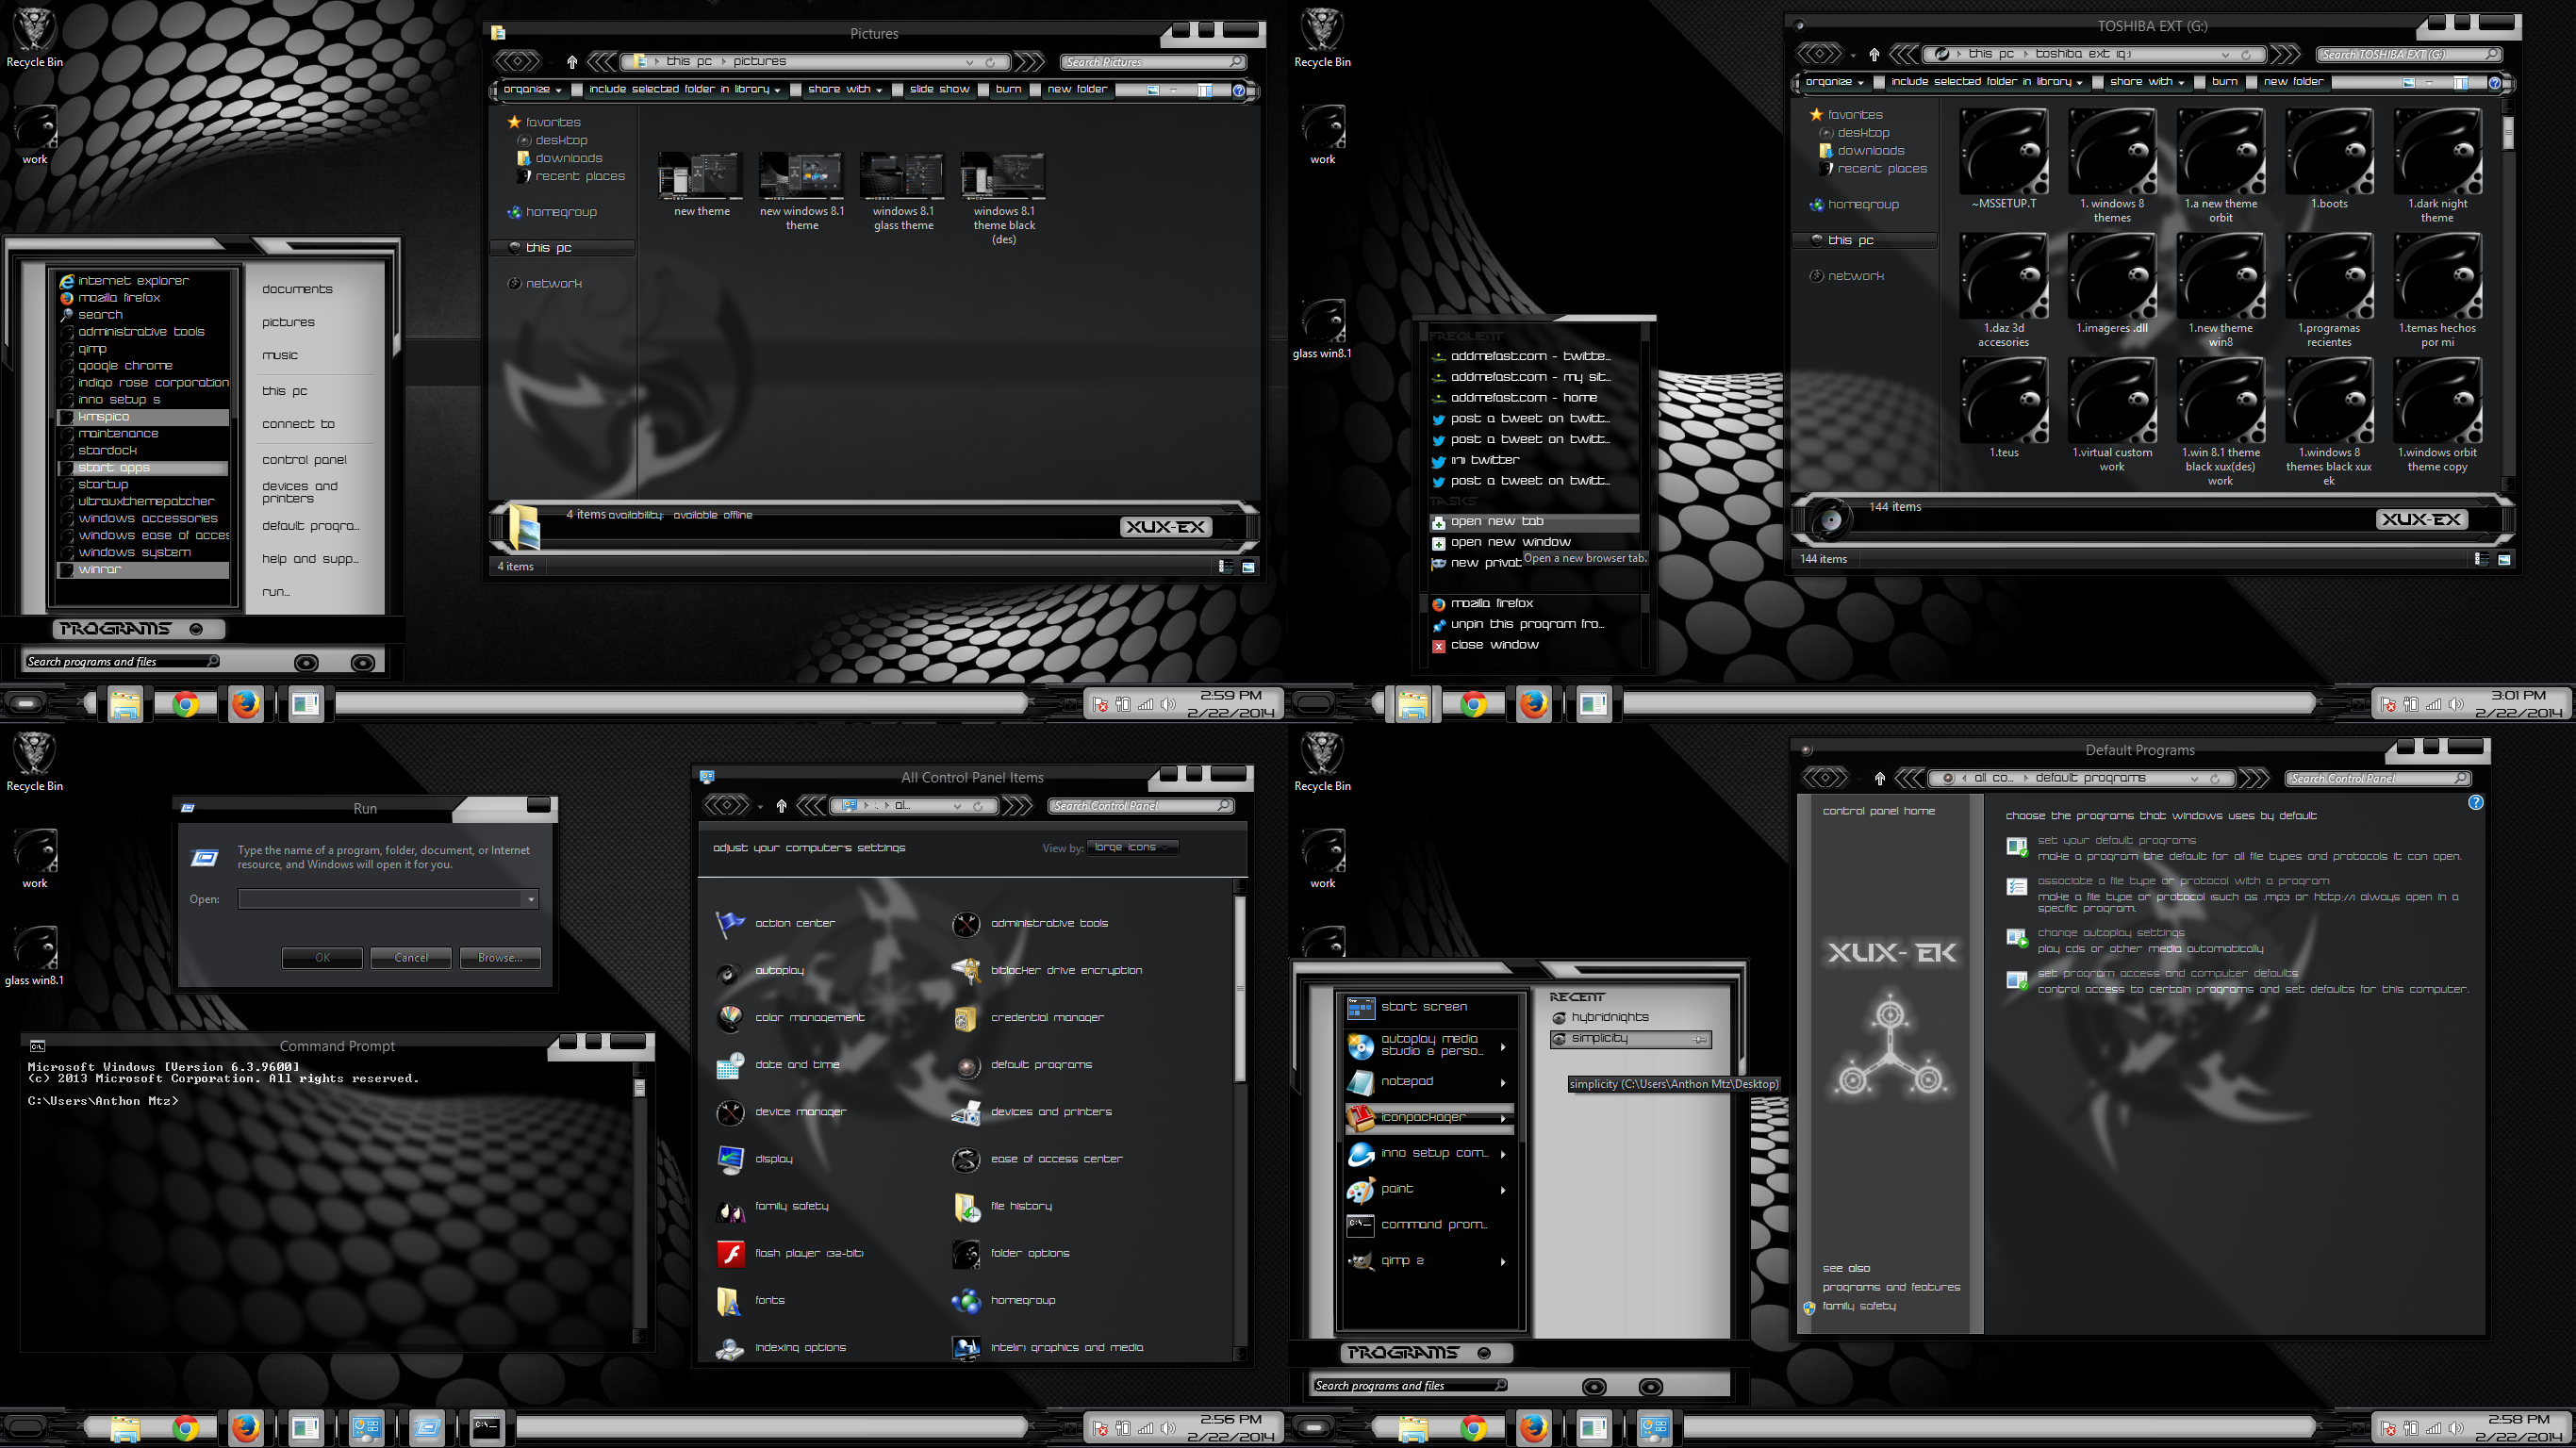 Download windows 8 boot skin